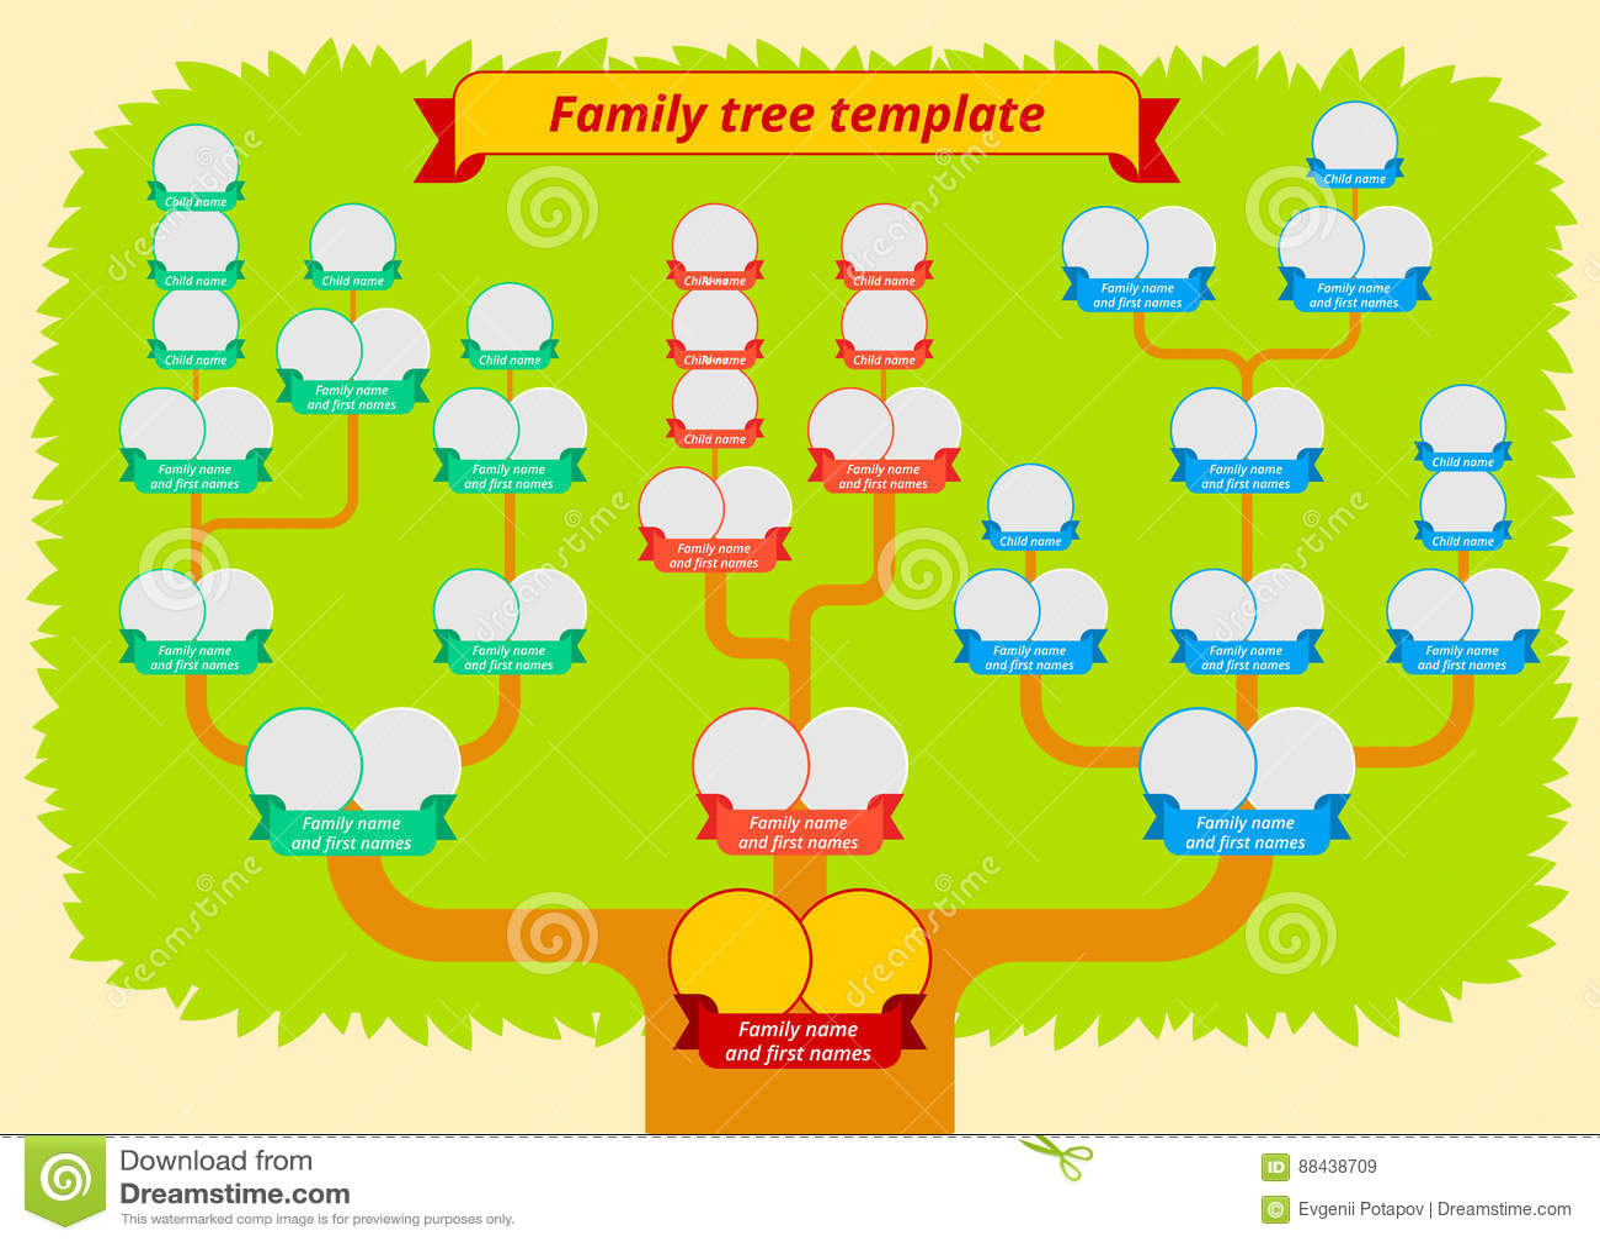 Family Tree Genealogy Table Stock Vector Illustration Of Family